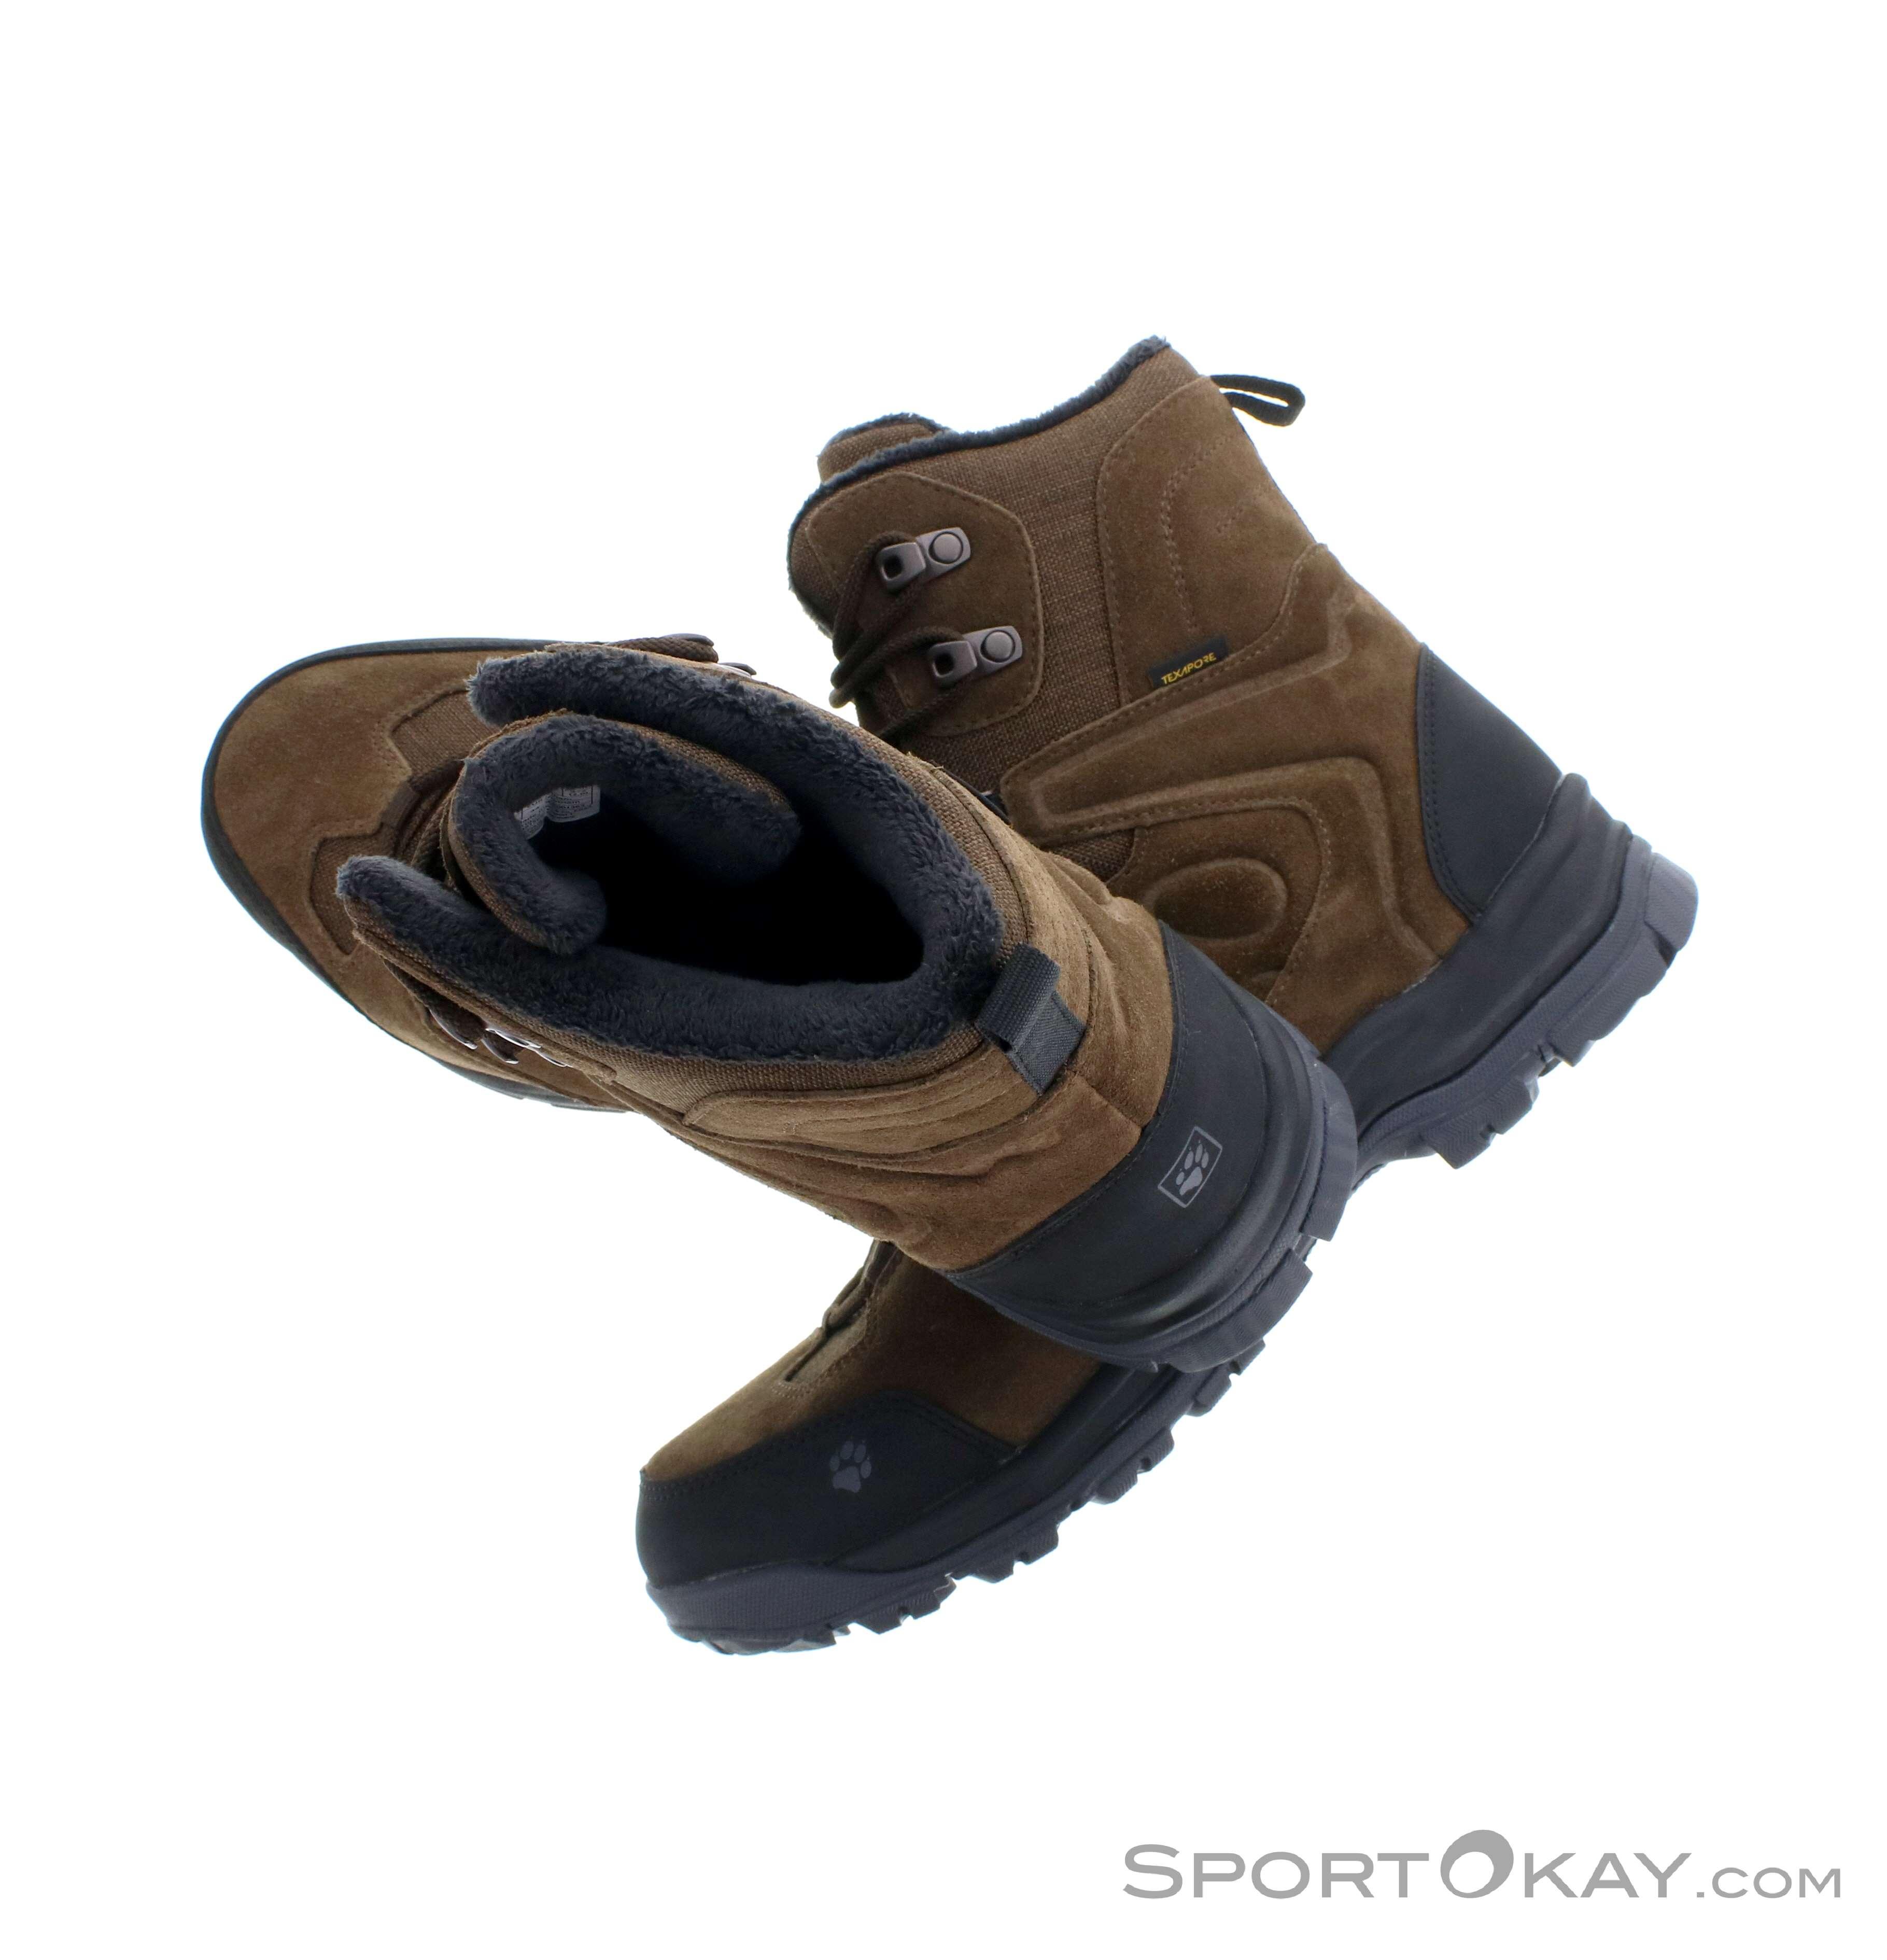 Jack Wolfskin Jack Wolfskin Thunder Bay Texapore High Mens Winter Shoes